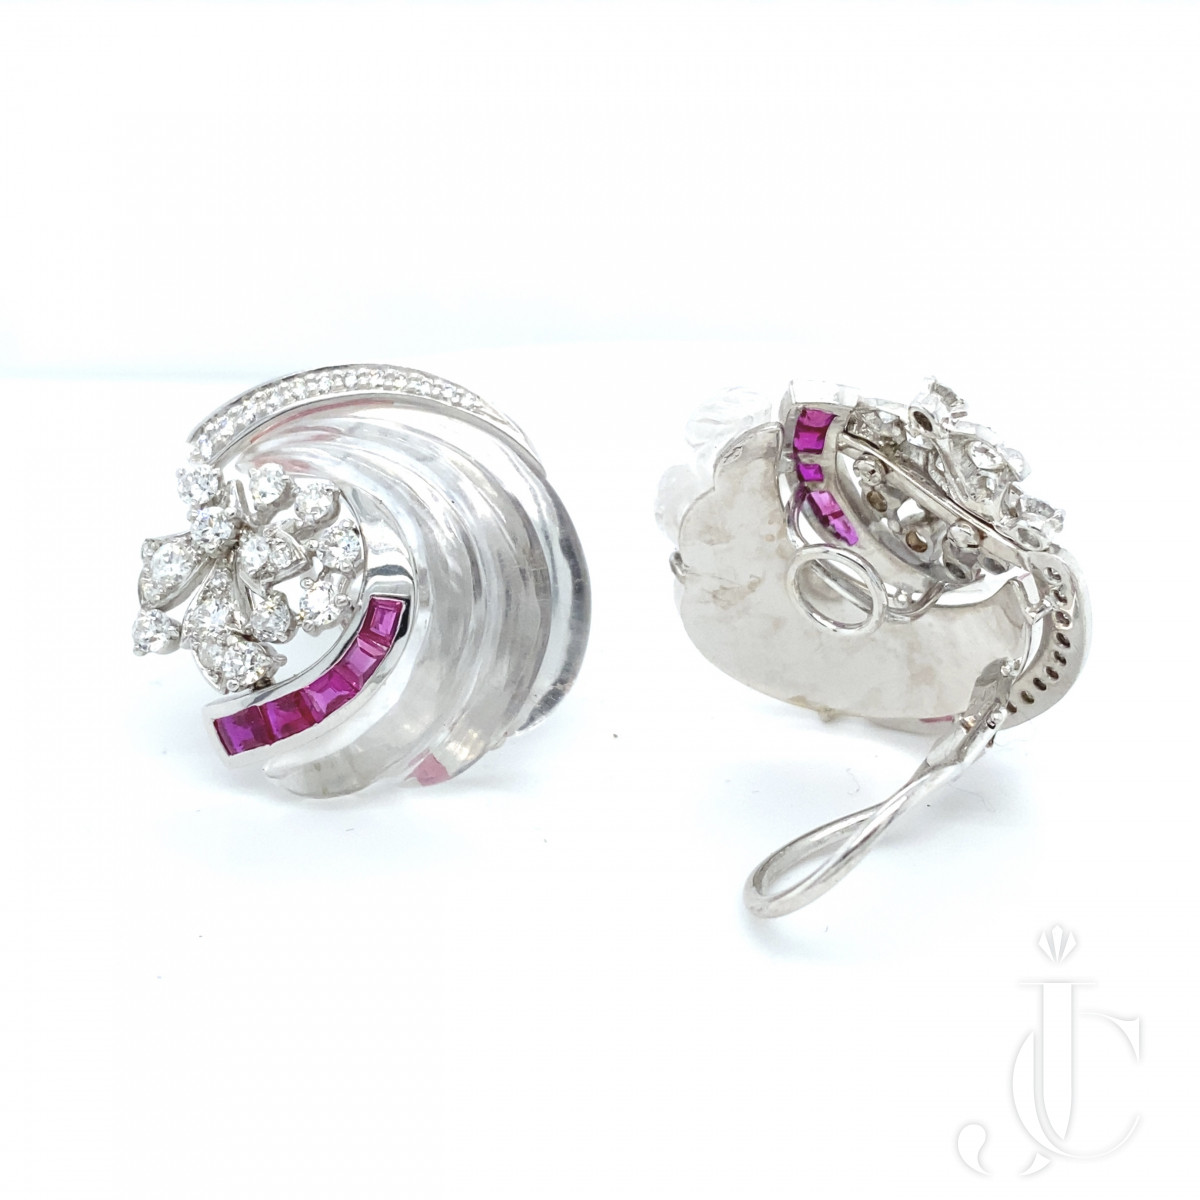 Rock Crystal Ruby Earrings